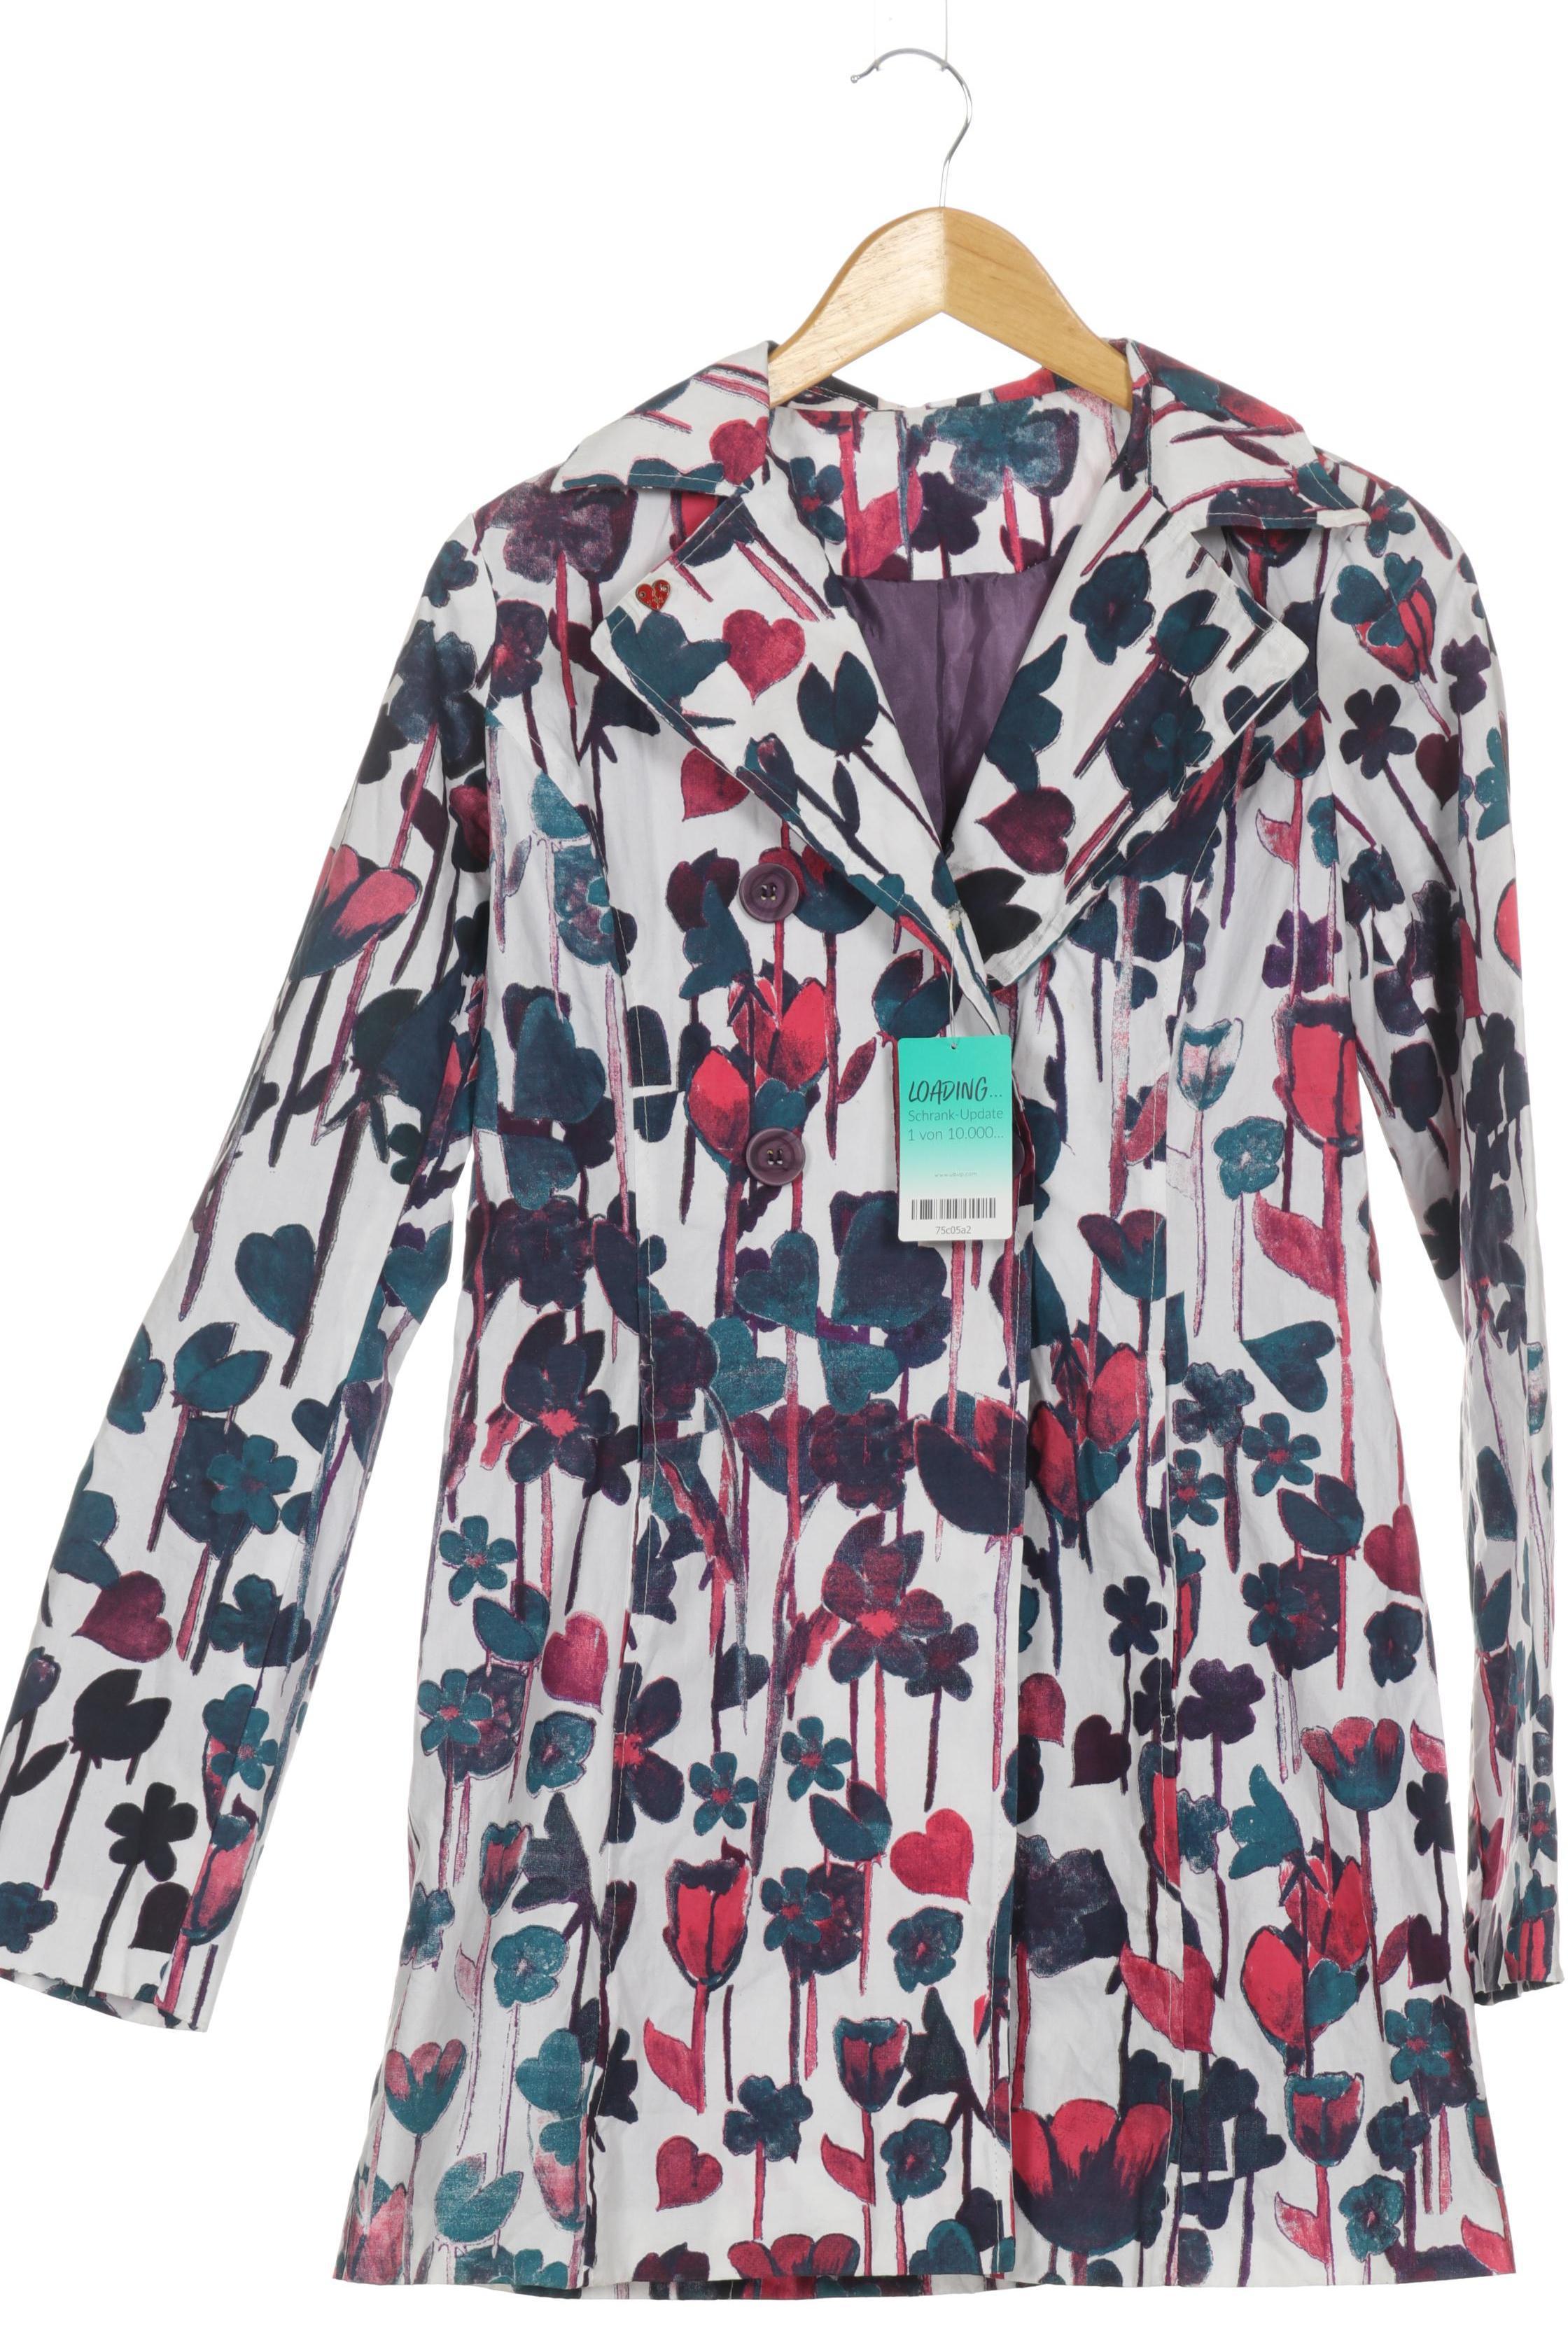 Mantel Maße Blutsgeschwister Damen INT L Gesamtlänge95cmMaße Schulterbreite41cm bfY67gyv